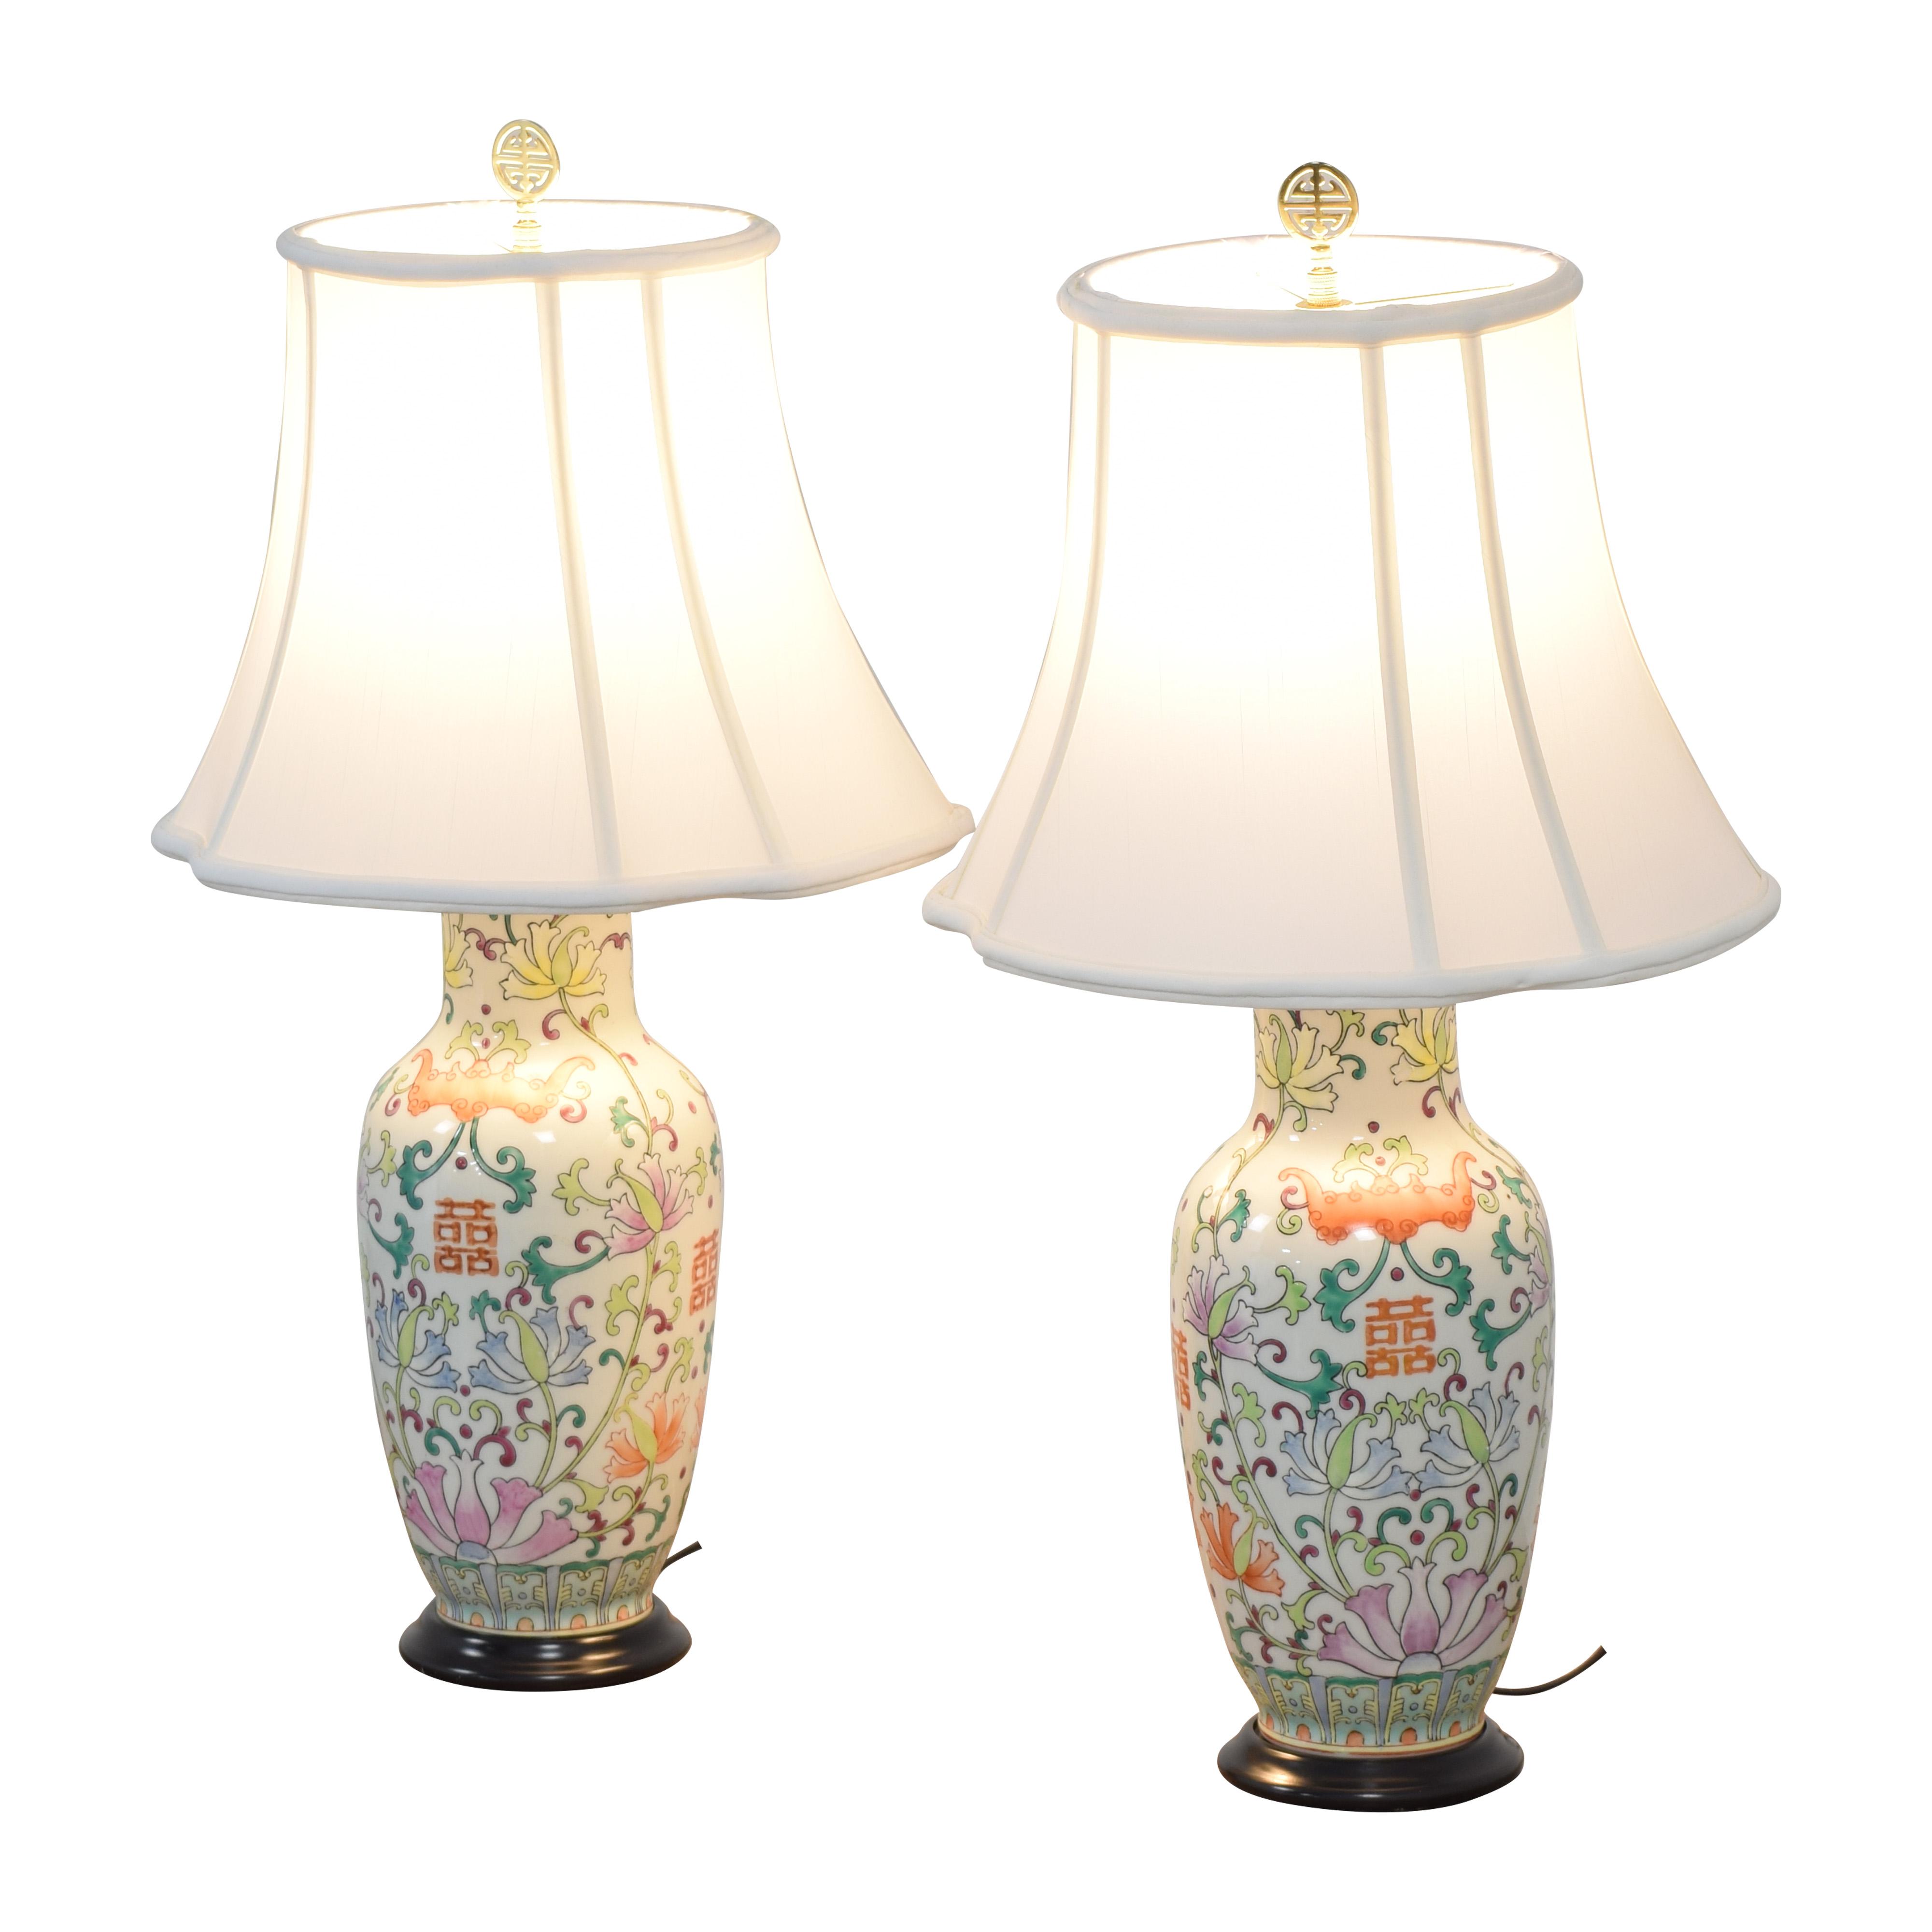 Bloomingdale's Bloomingdale's Floral Table Lamps multicolored